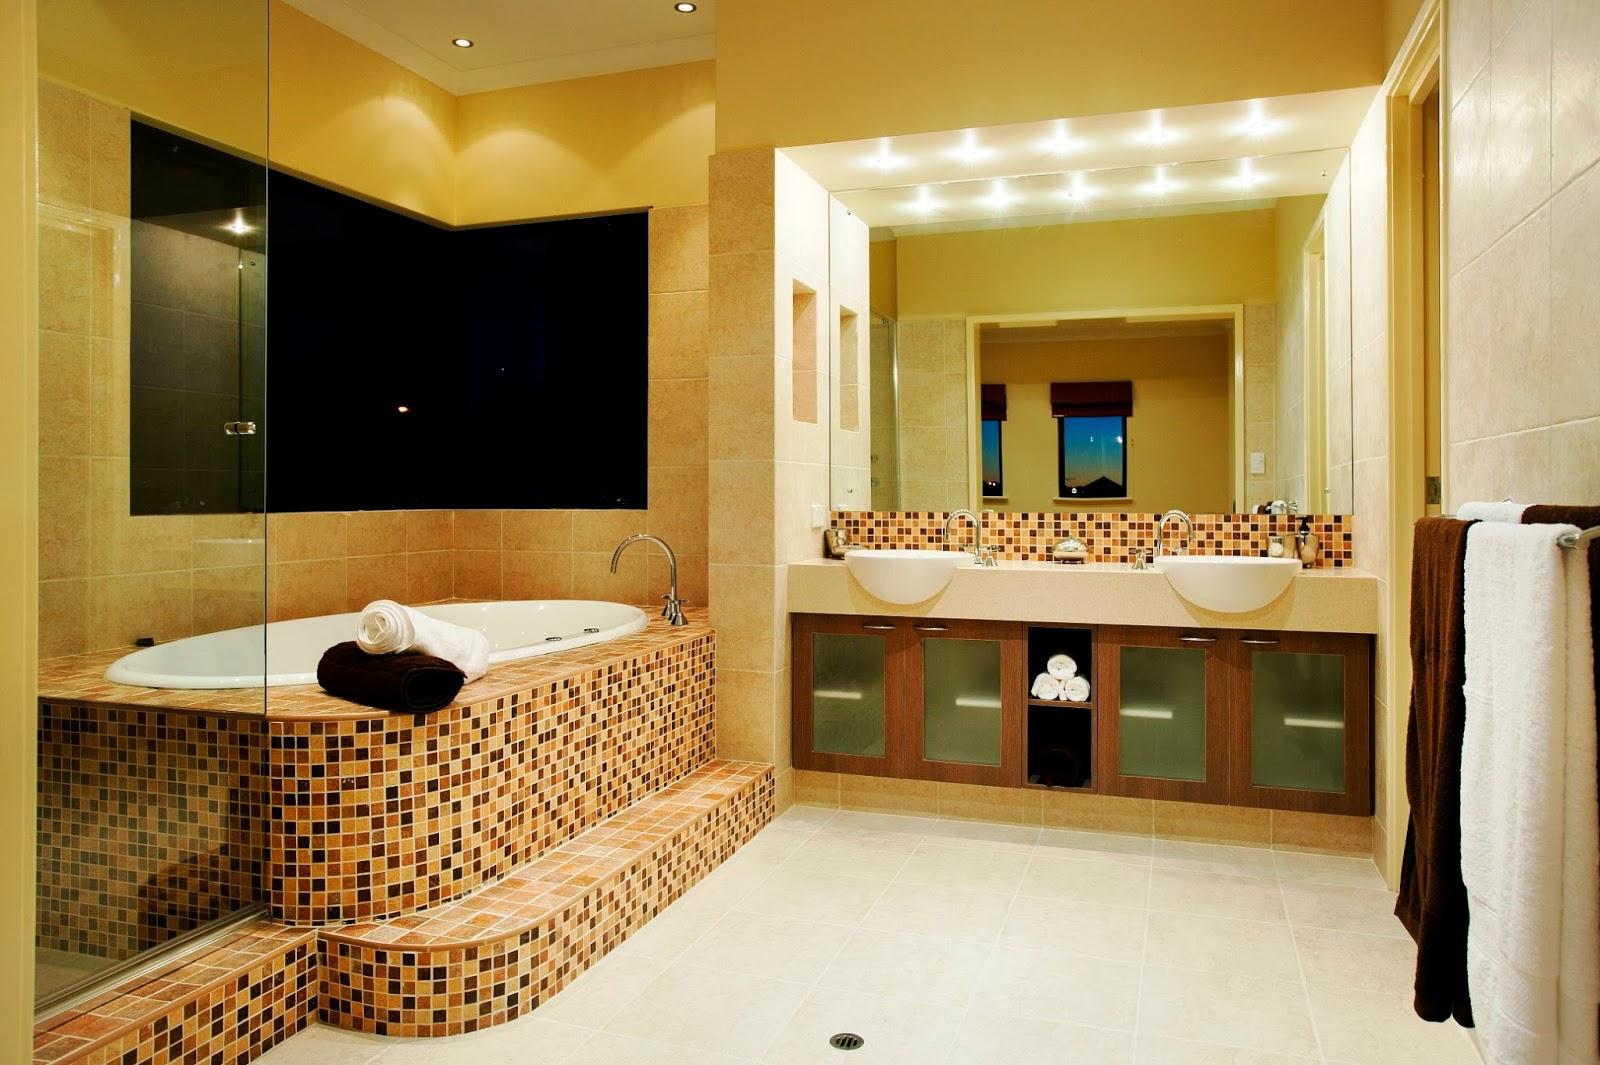 Ikea bathroom design ideas 2012 - Bathroom Fixtures Designs